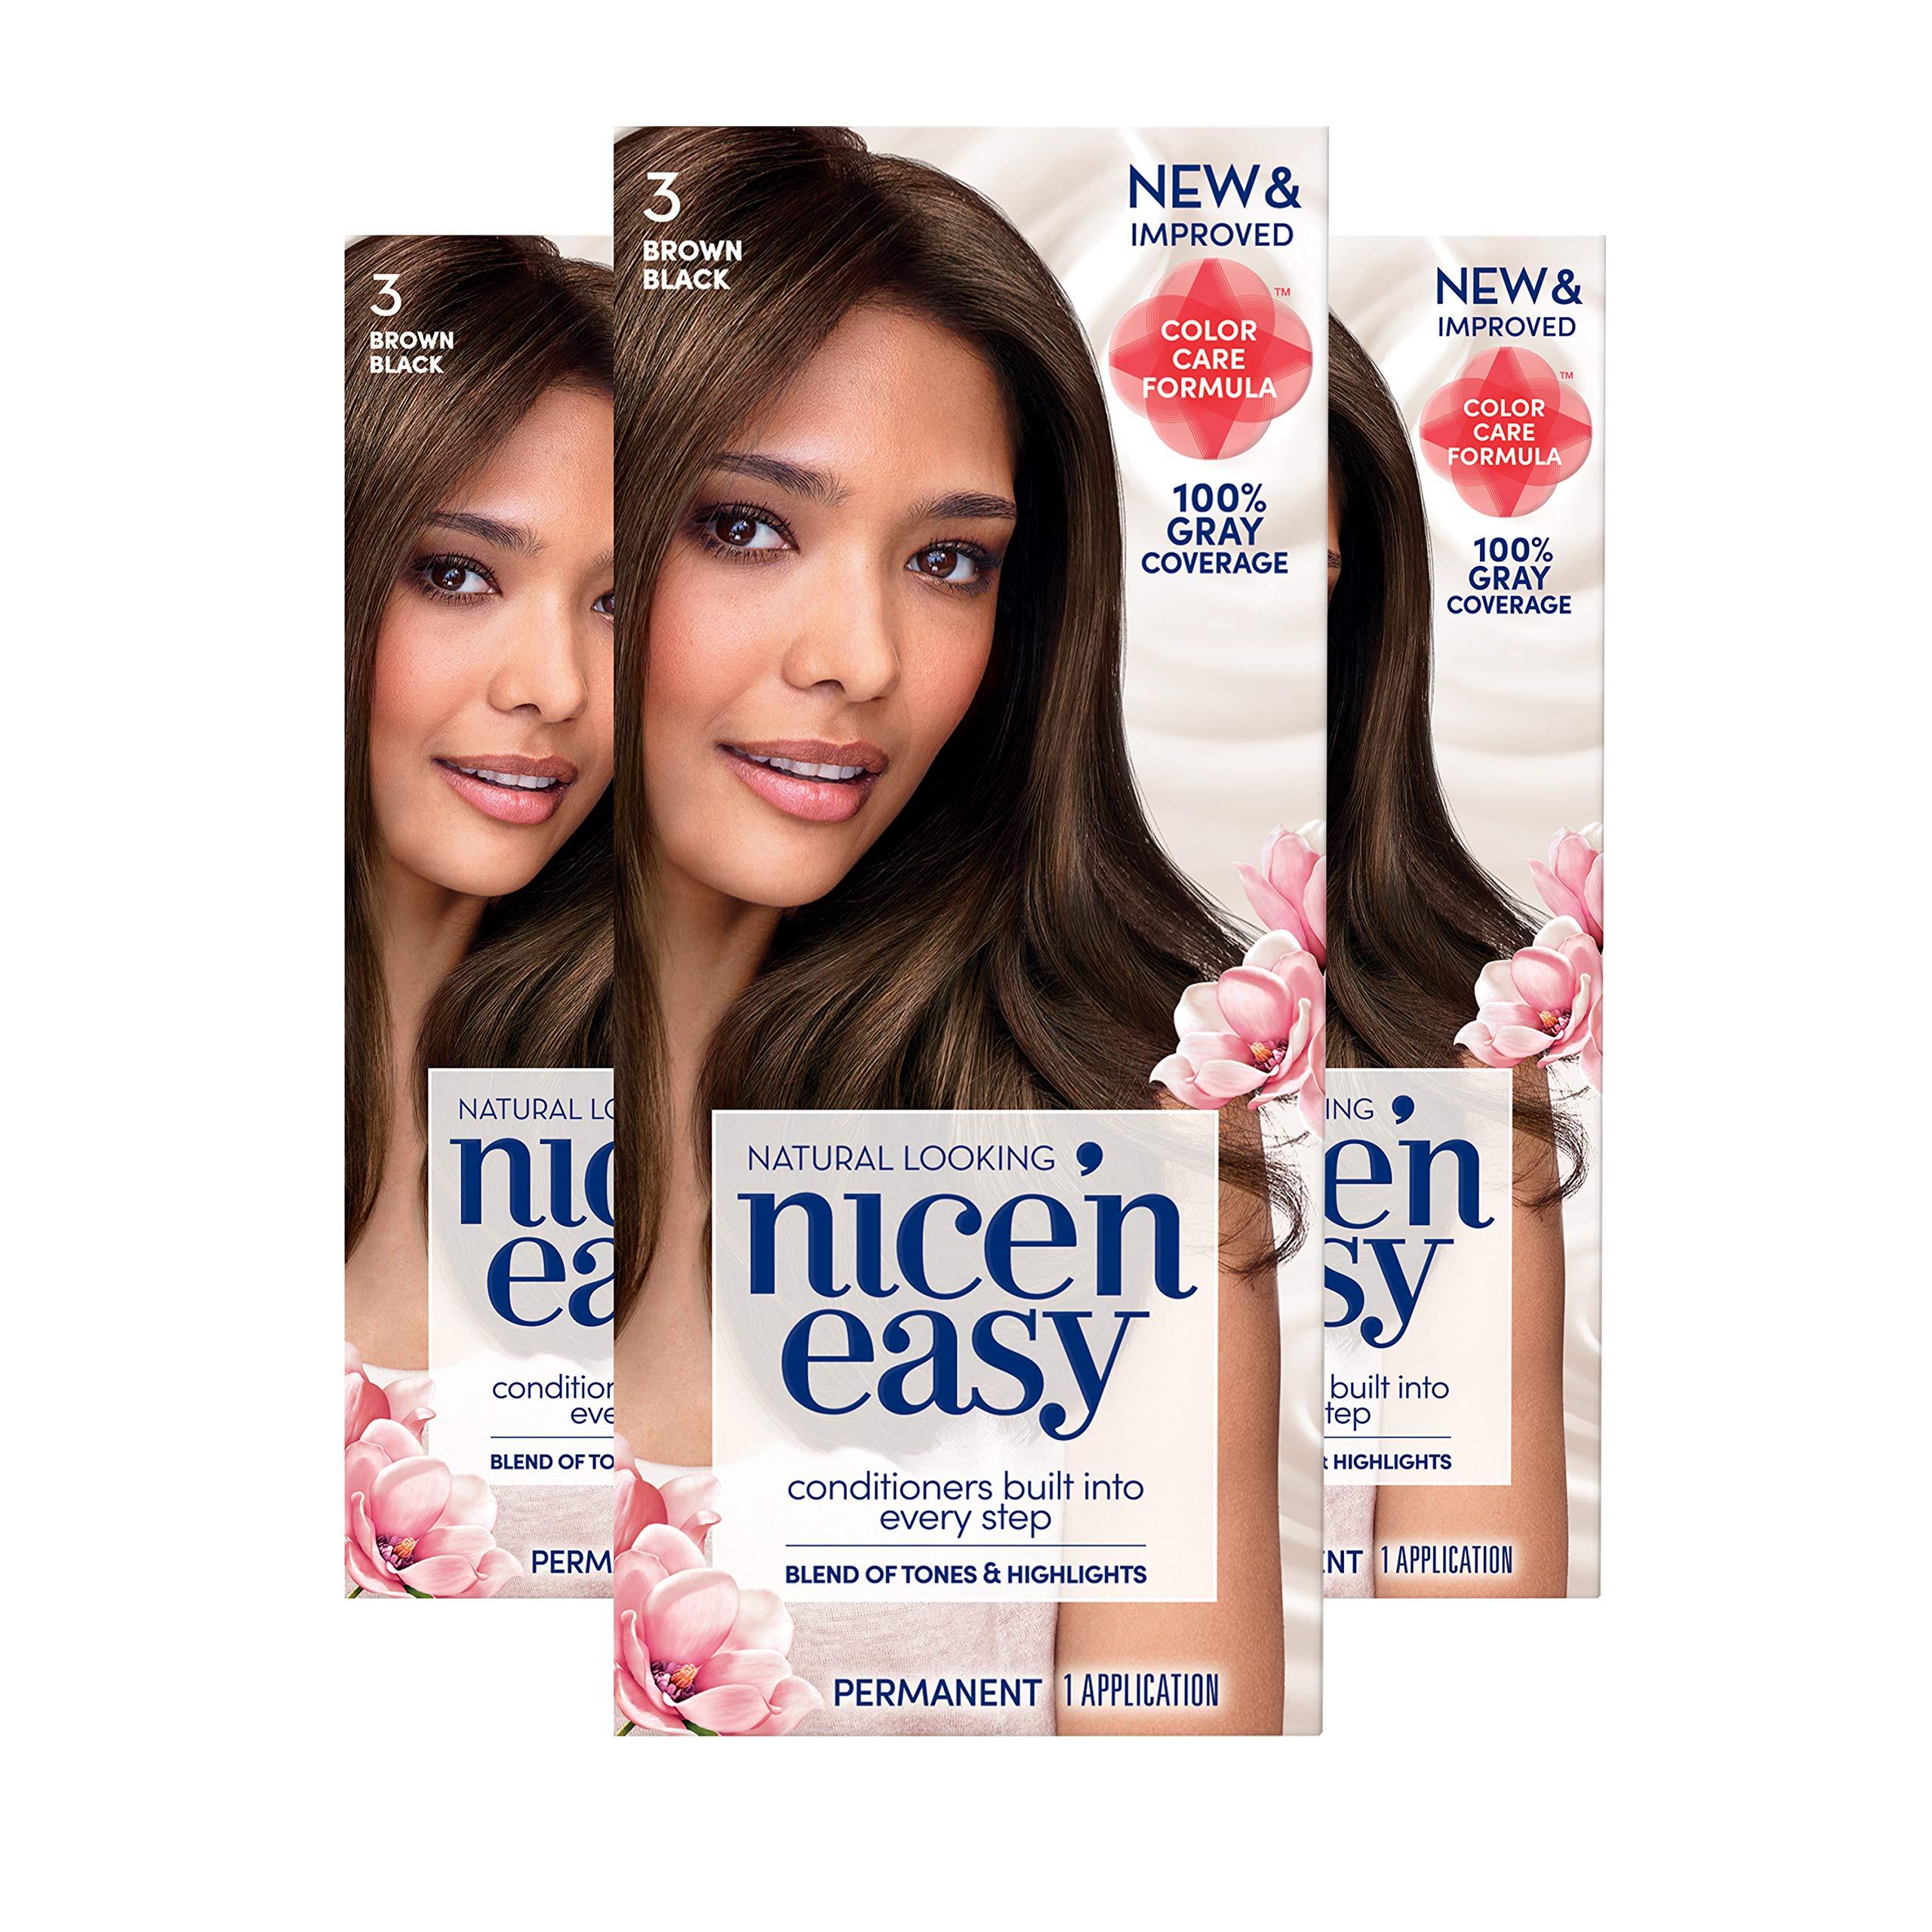 Clairol Nice 'n Easy Permanent Hair Color, 3 Brown Black, 3 Count, (Packaging May Vary) by Clairol